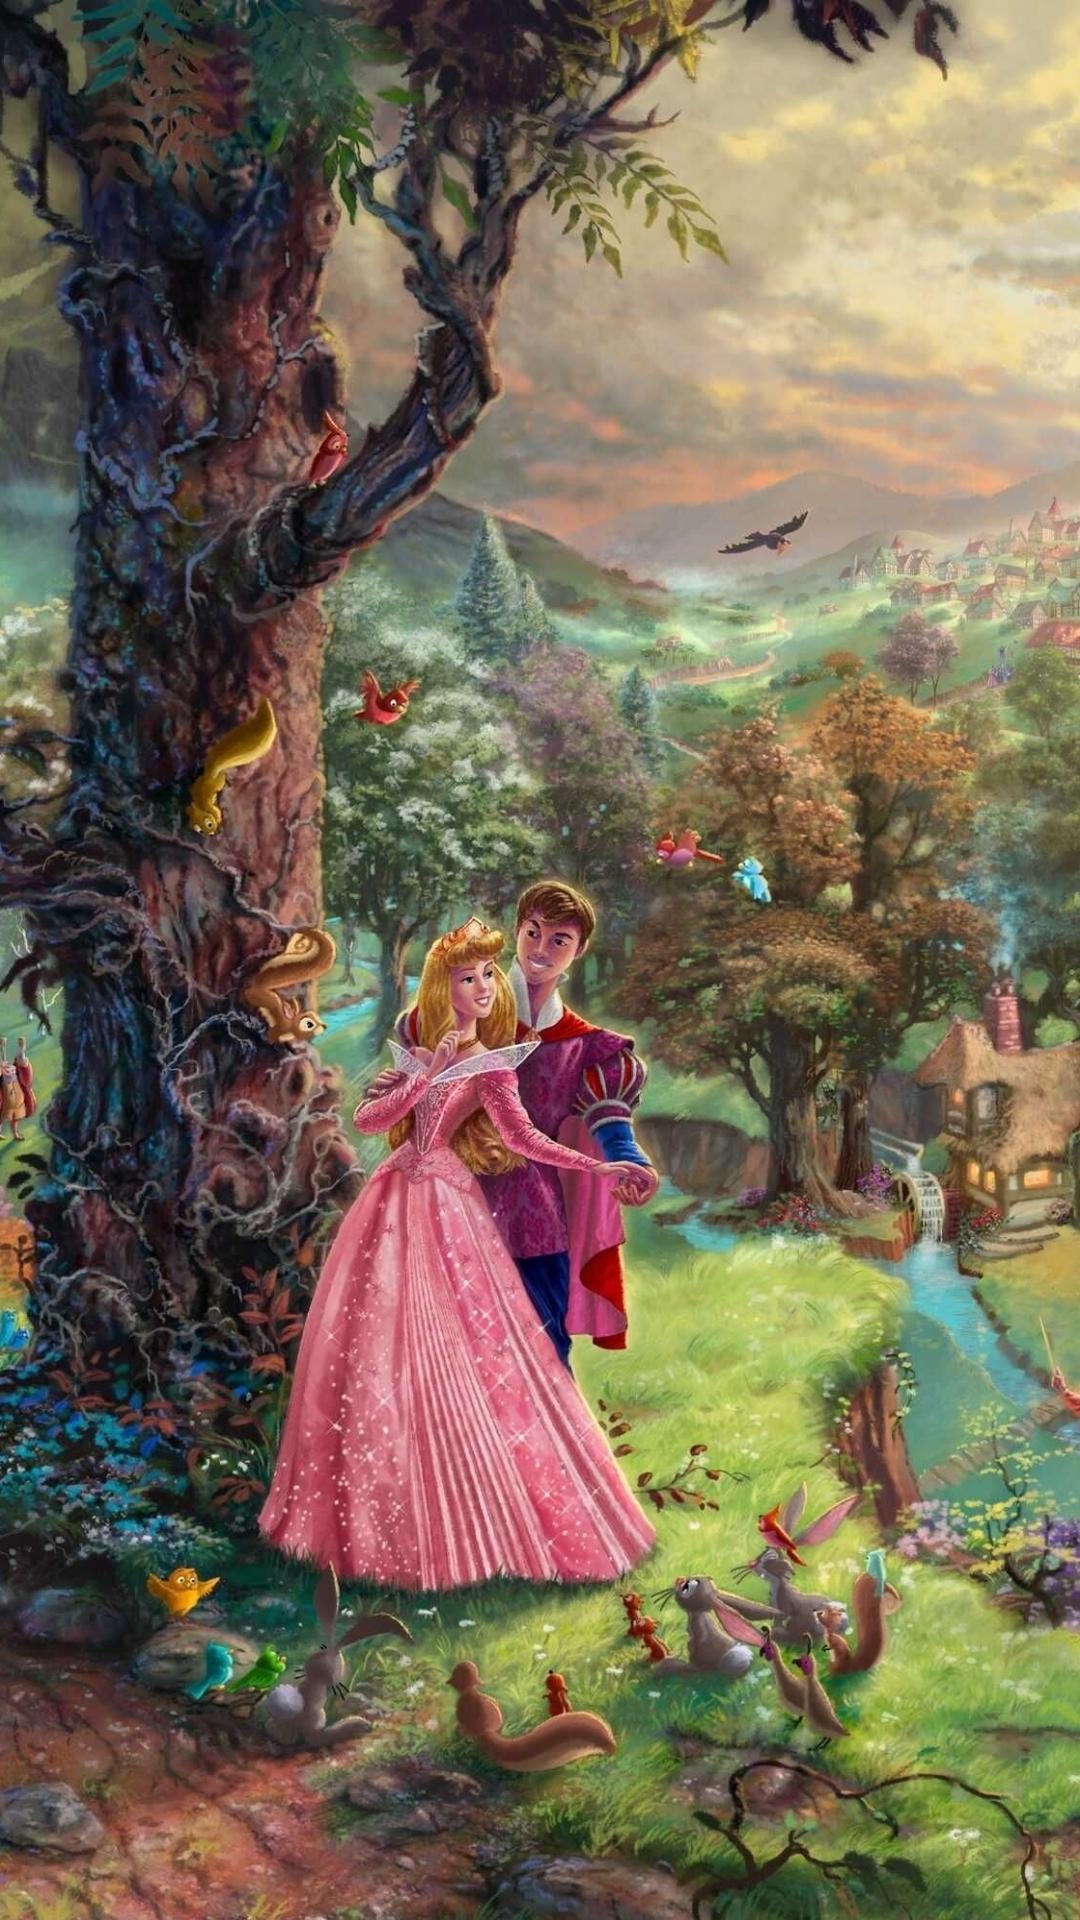 Download Sleeping Beauty Iphone Wallpaper Gallery